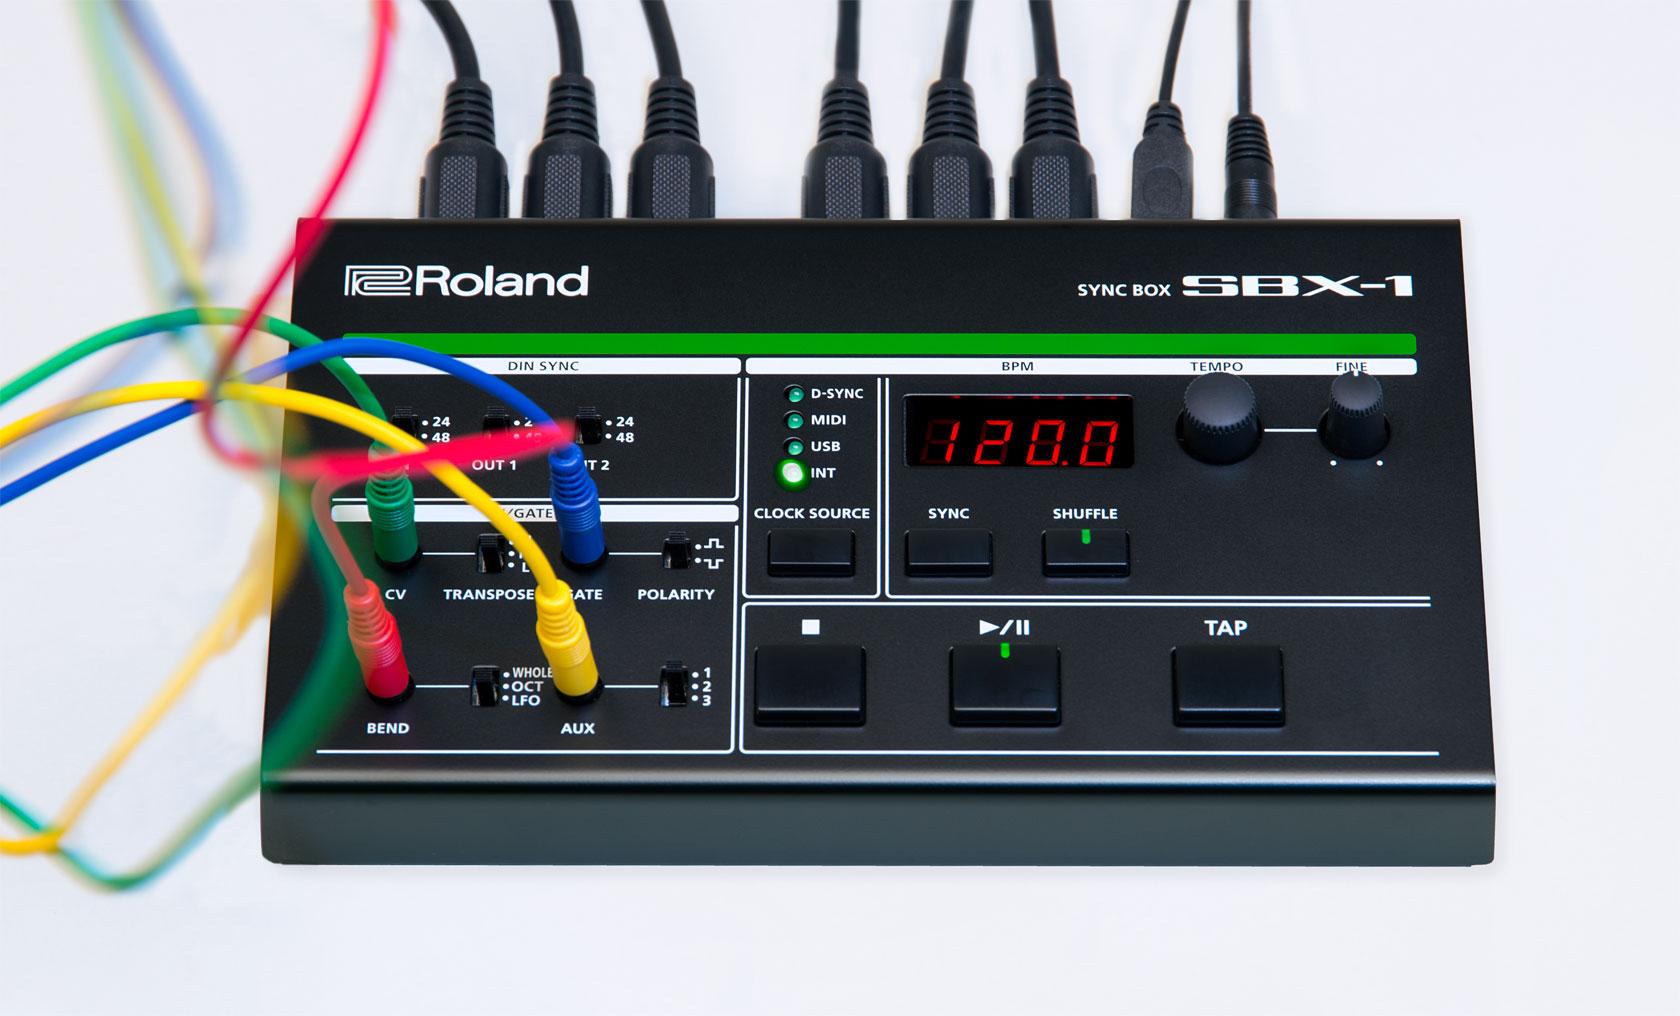 Roland Sbx 1 Sync Box